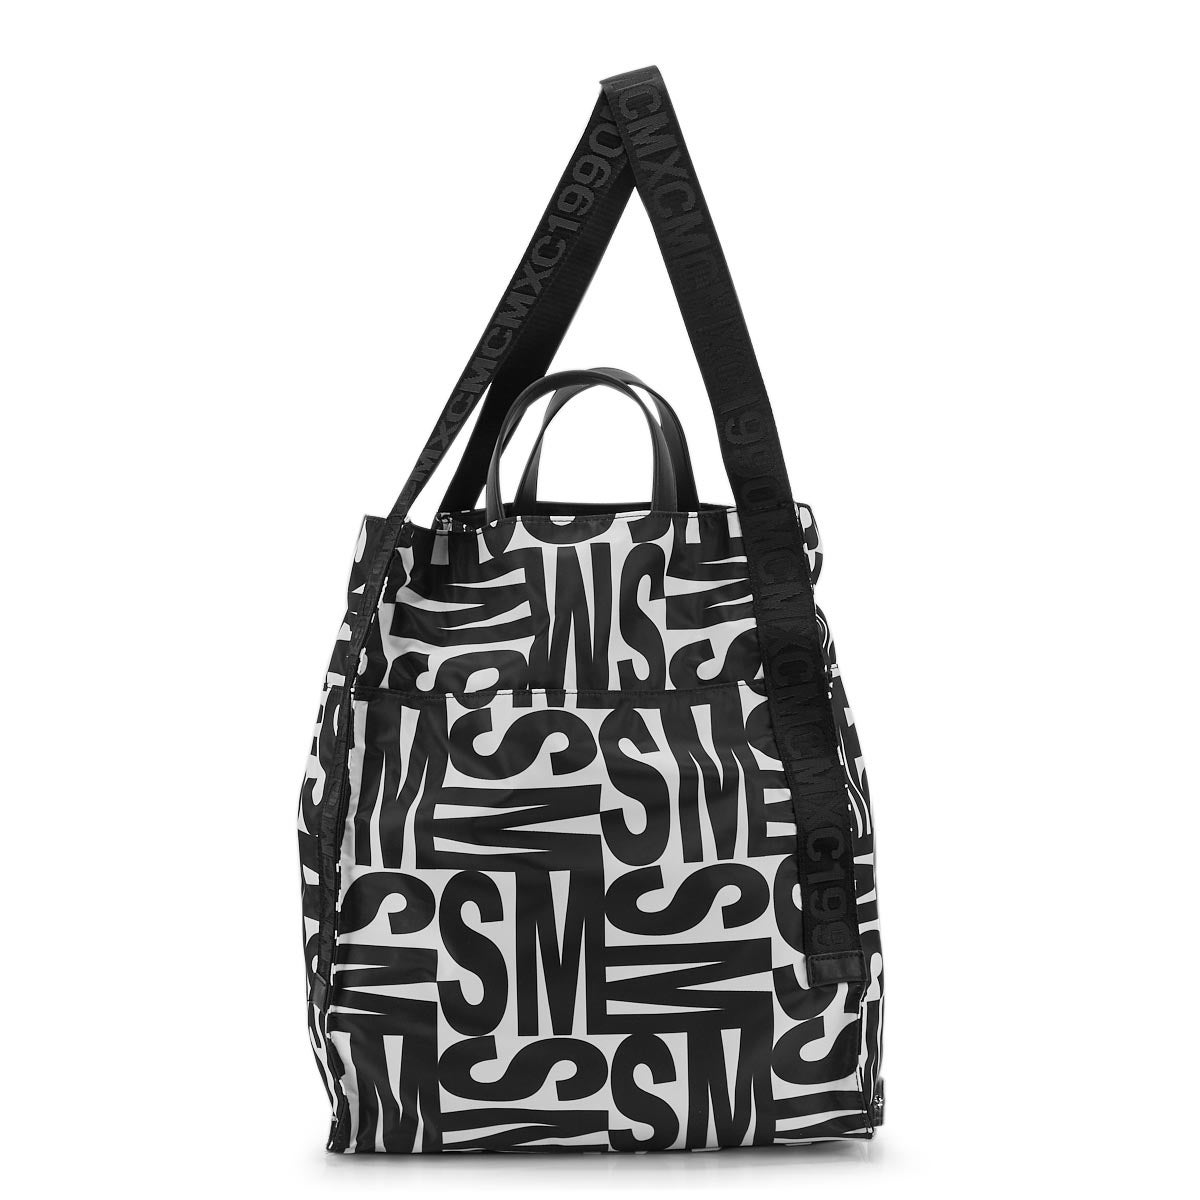 Lds BErica black/white tote bag